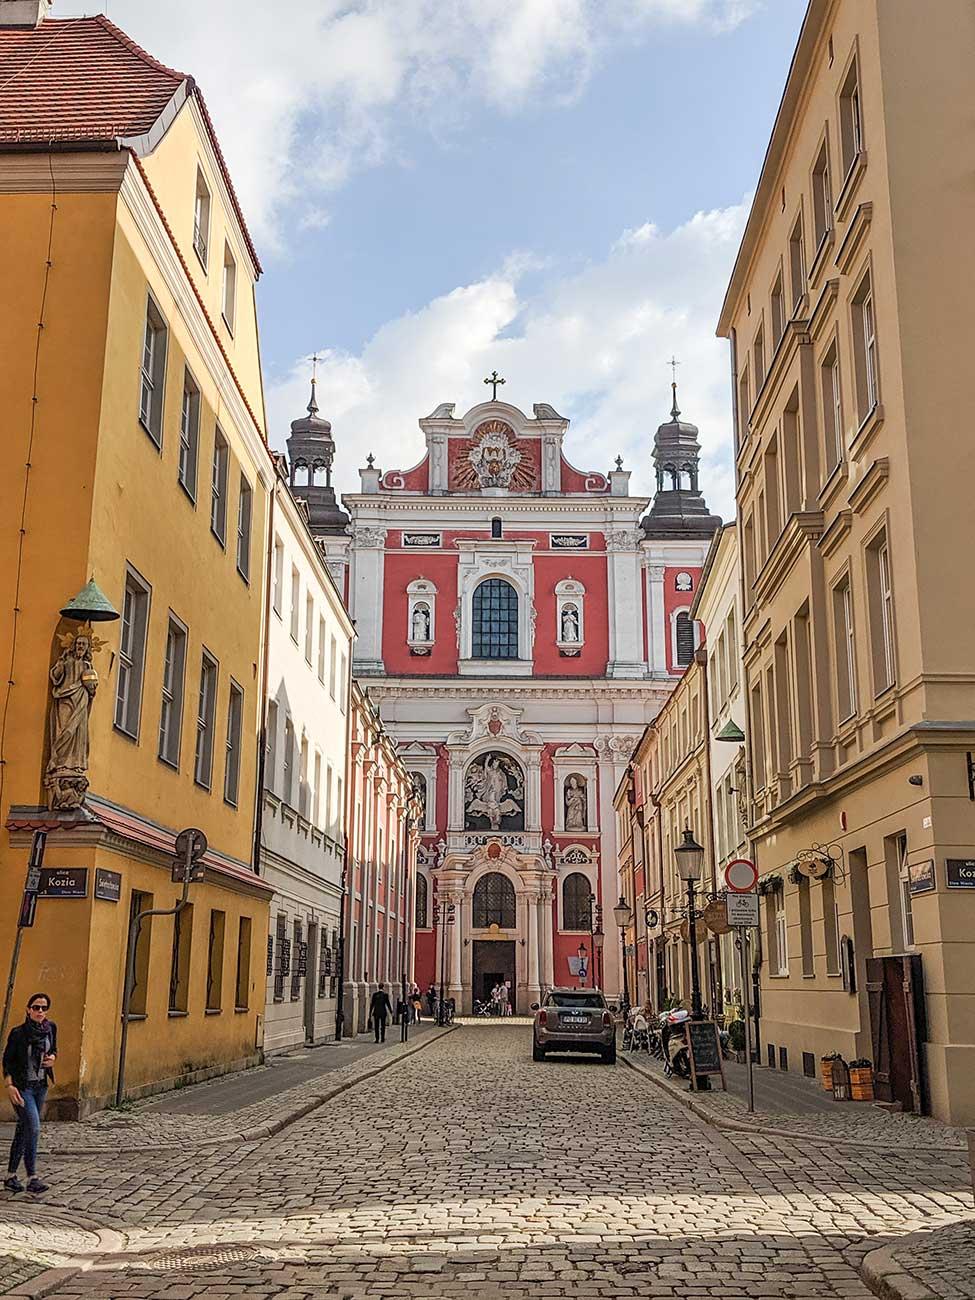 Fara Poznania from the street